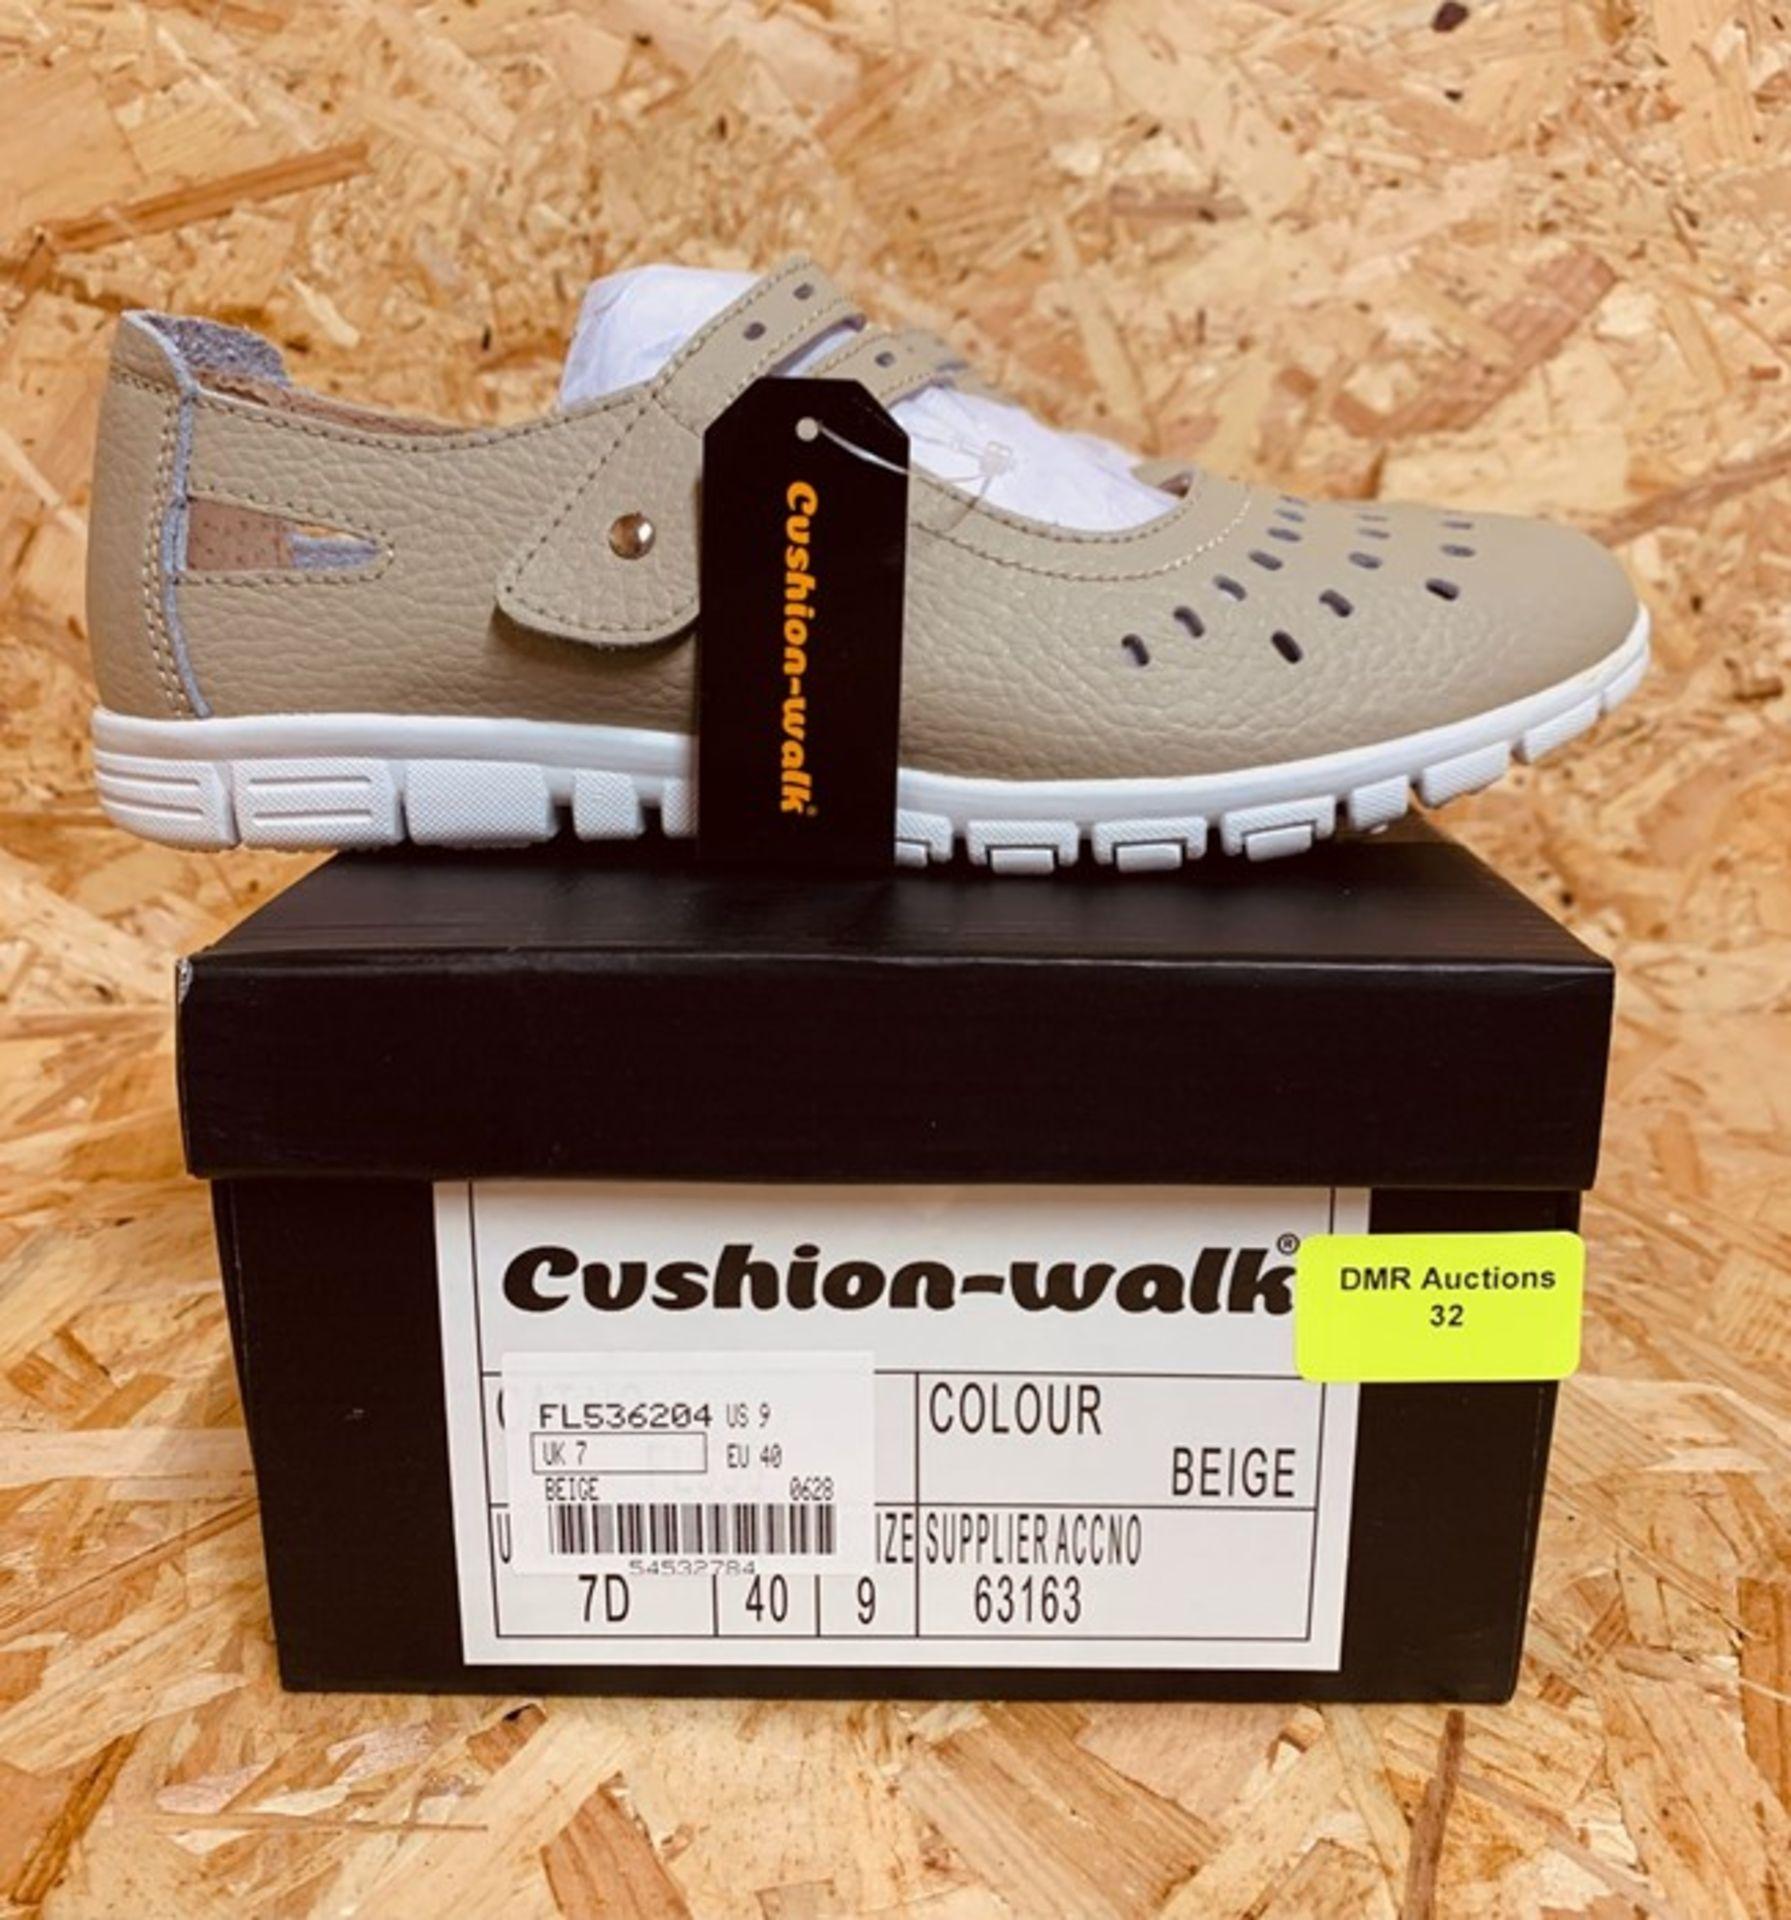 CUSHION-WALK LADIES LEATHER LINED SANDALS - UK SIZE 7/BEIGE